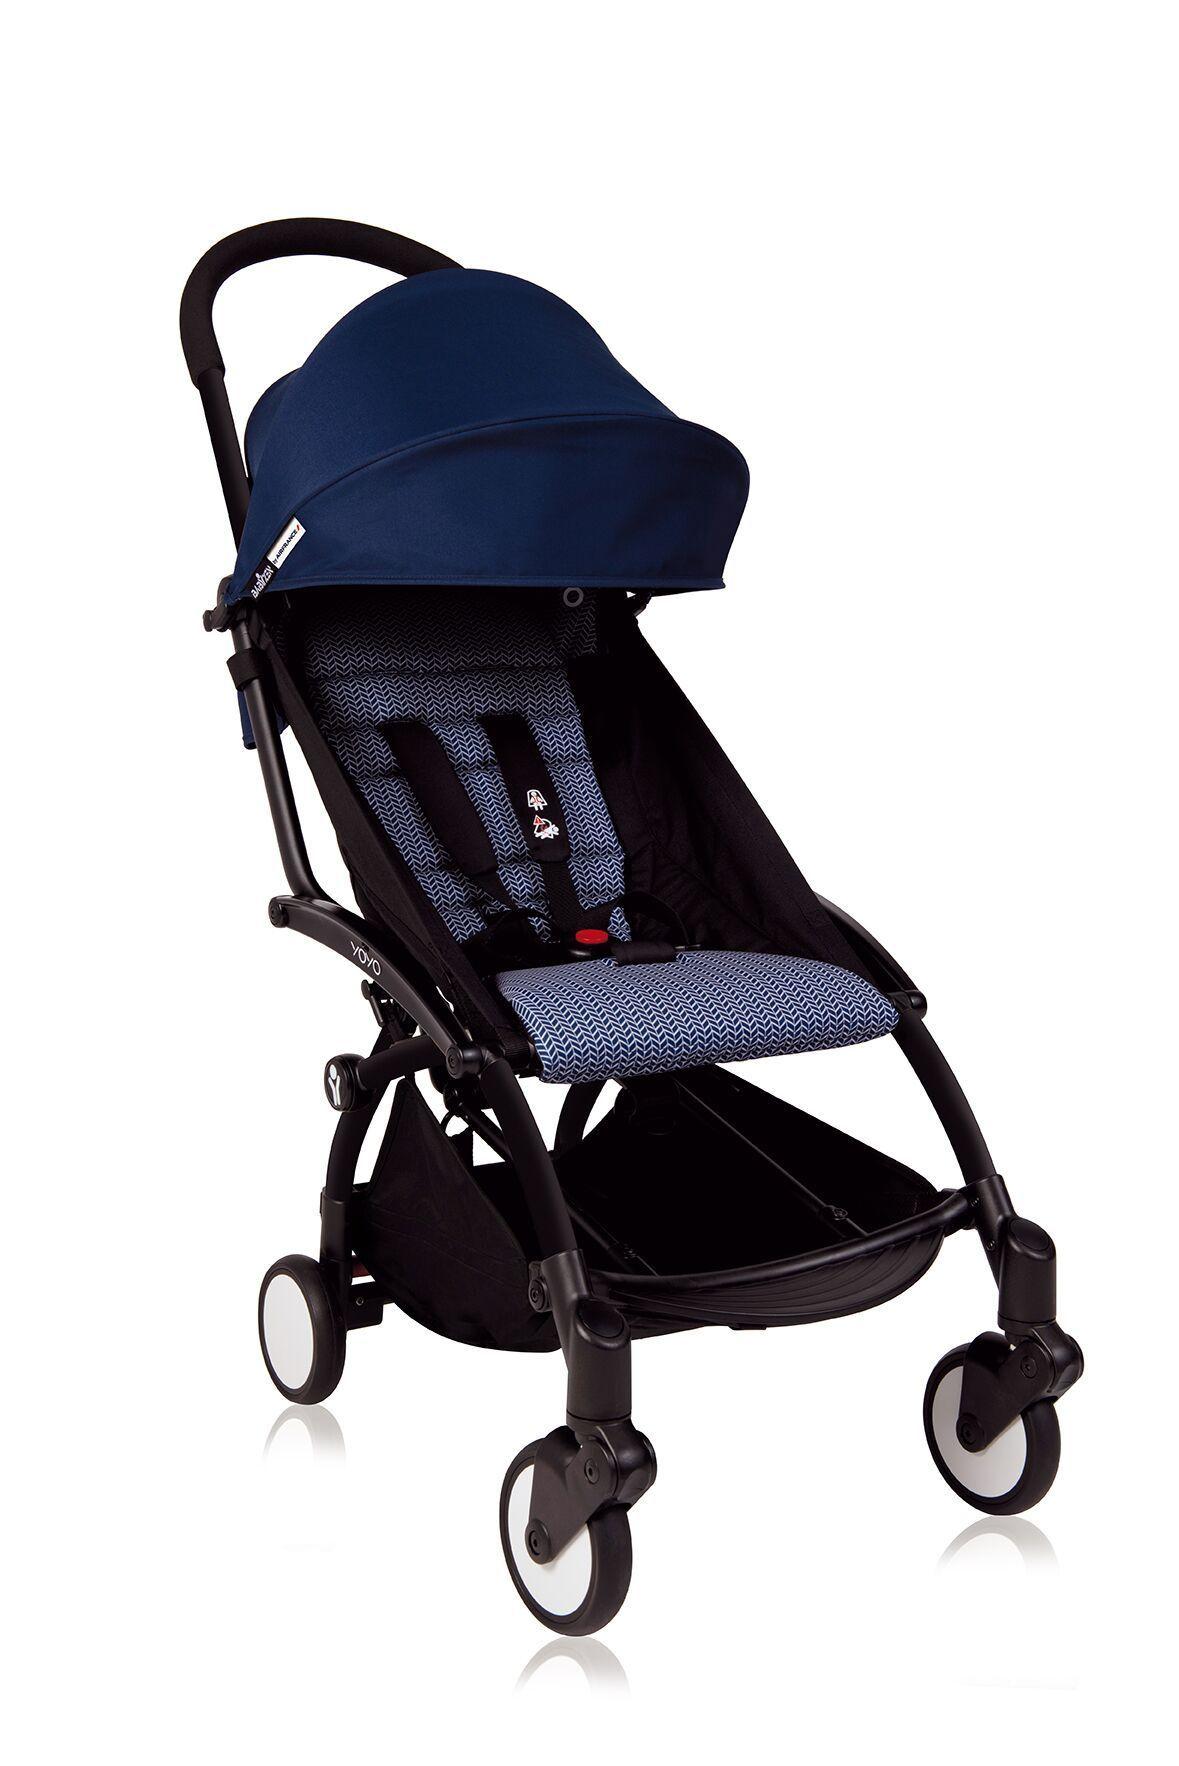 Babyzen YOYO+ 6+ Complete Stroller Baby strollers, Baby